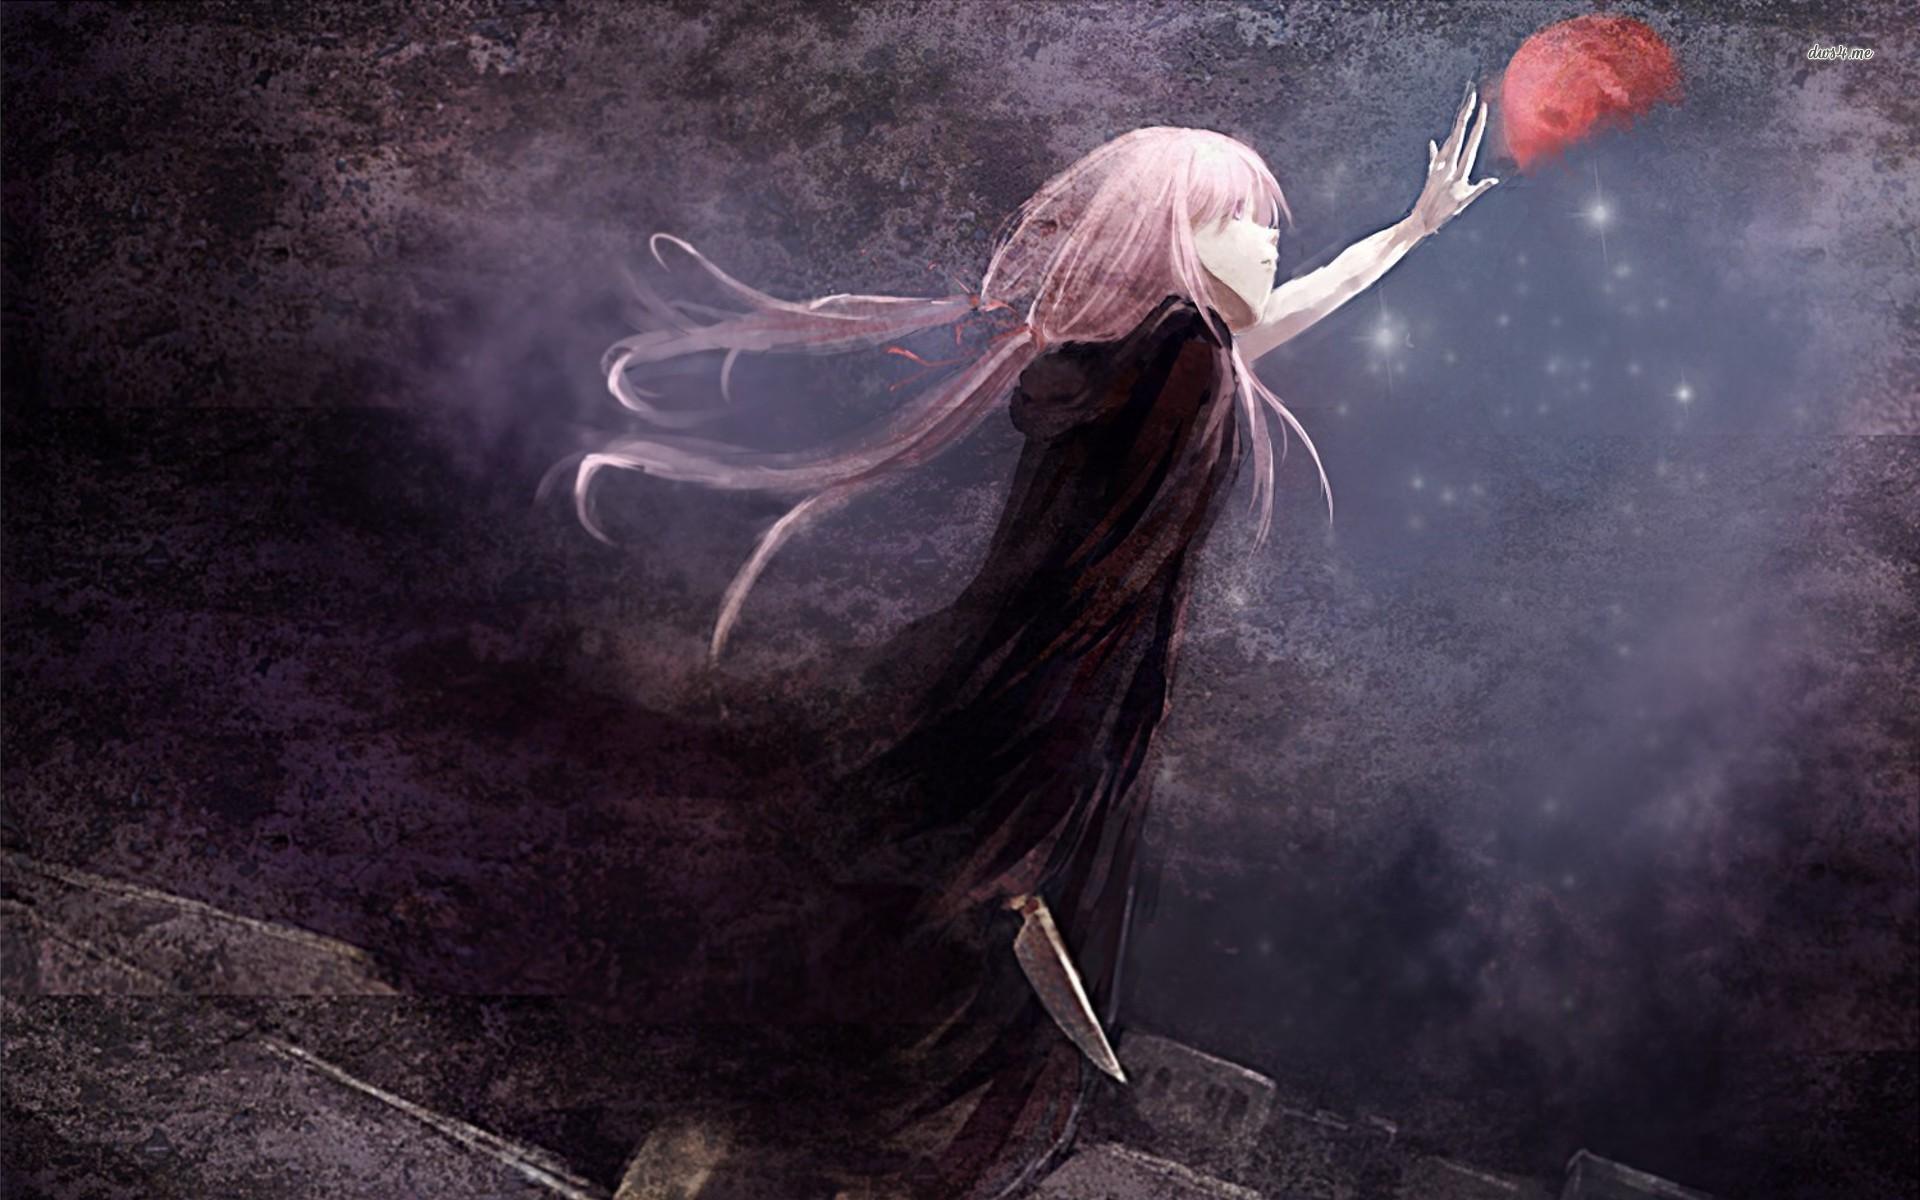 Yuno Gasai wallpaper ·① Download free awesome full HD ...